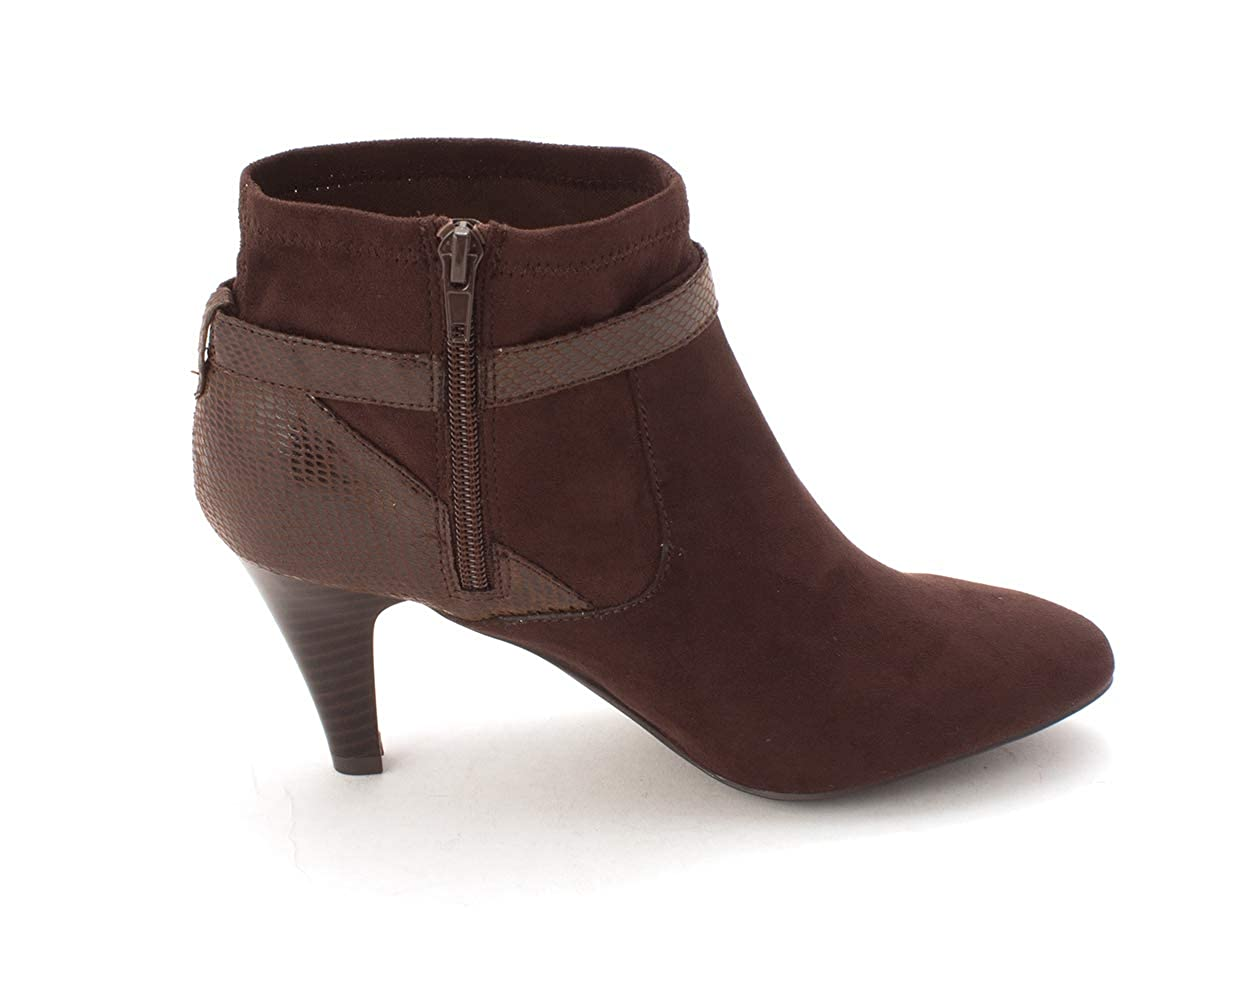 9ccc631c1b191e ... Karen Scott Scott Karen Frauen maxinee Geschlossener Zeh Fashion  Stiefel 31982c ...